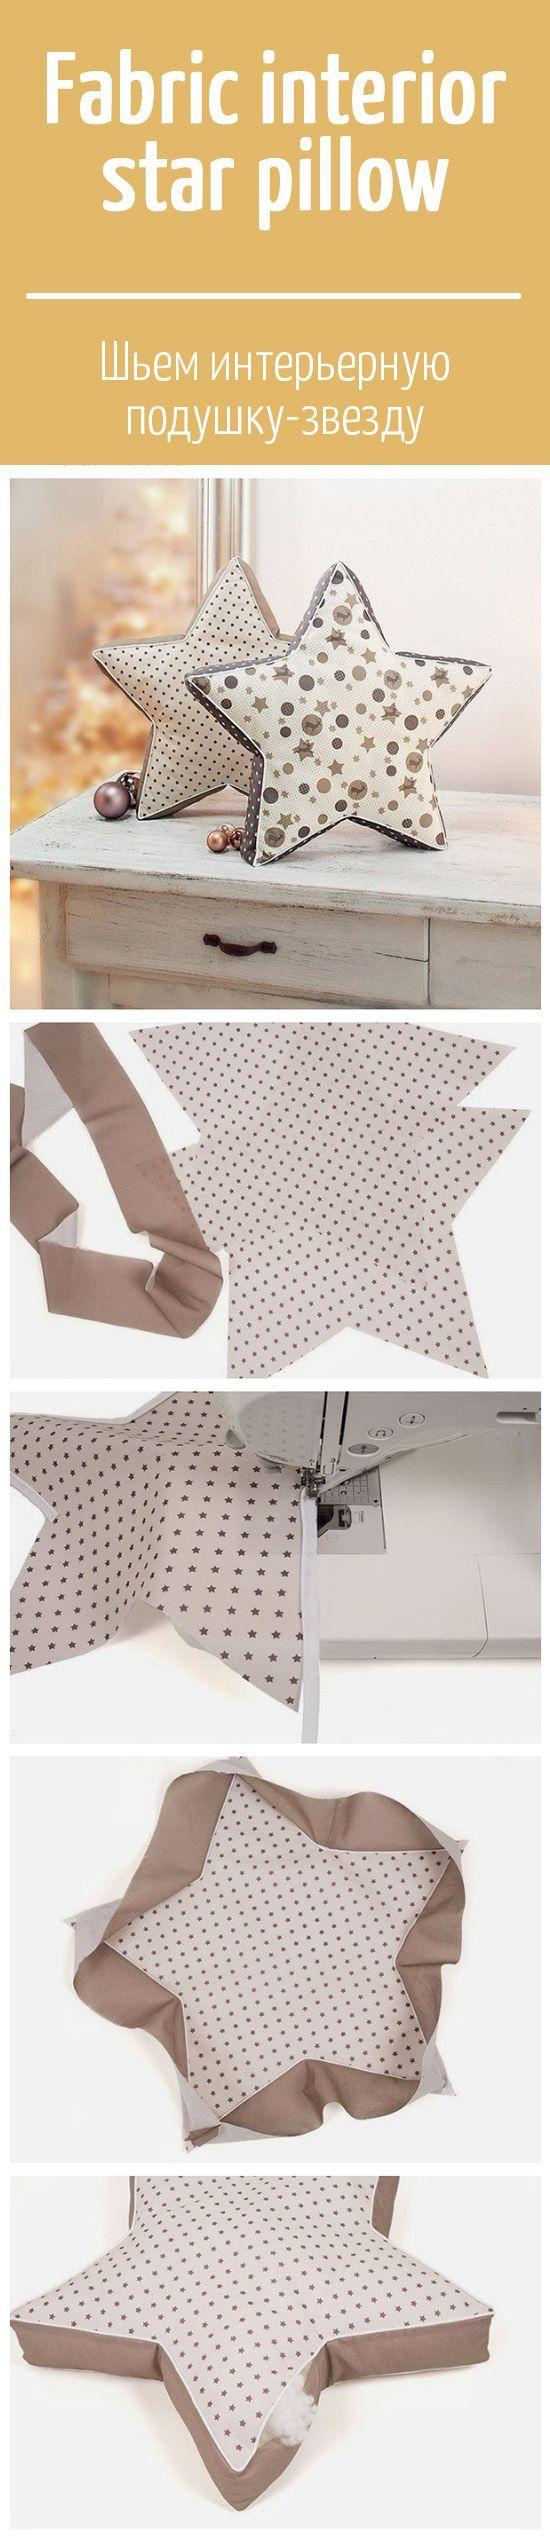 Fabrica almohadon estrella